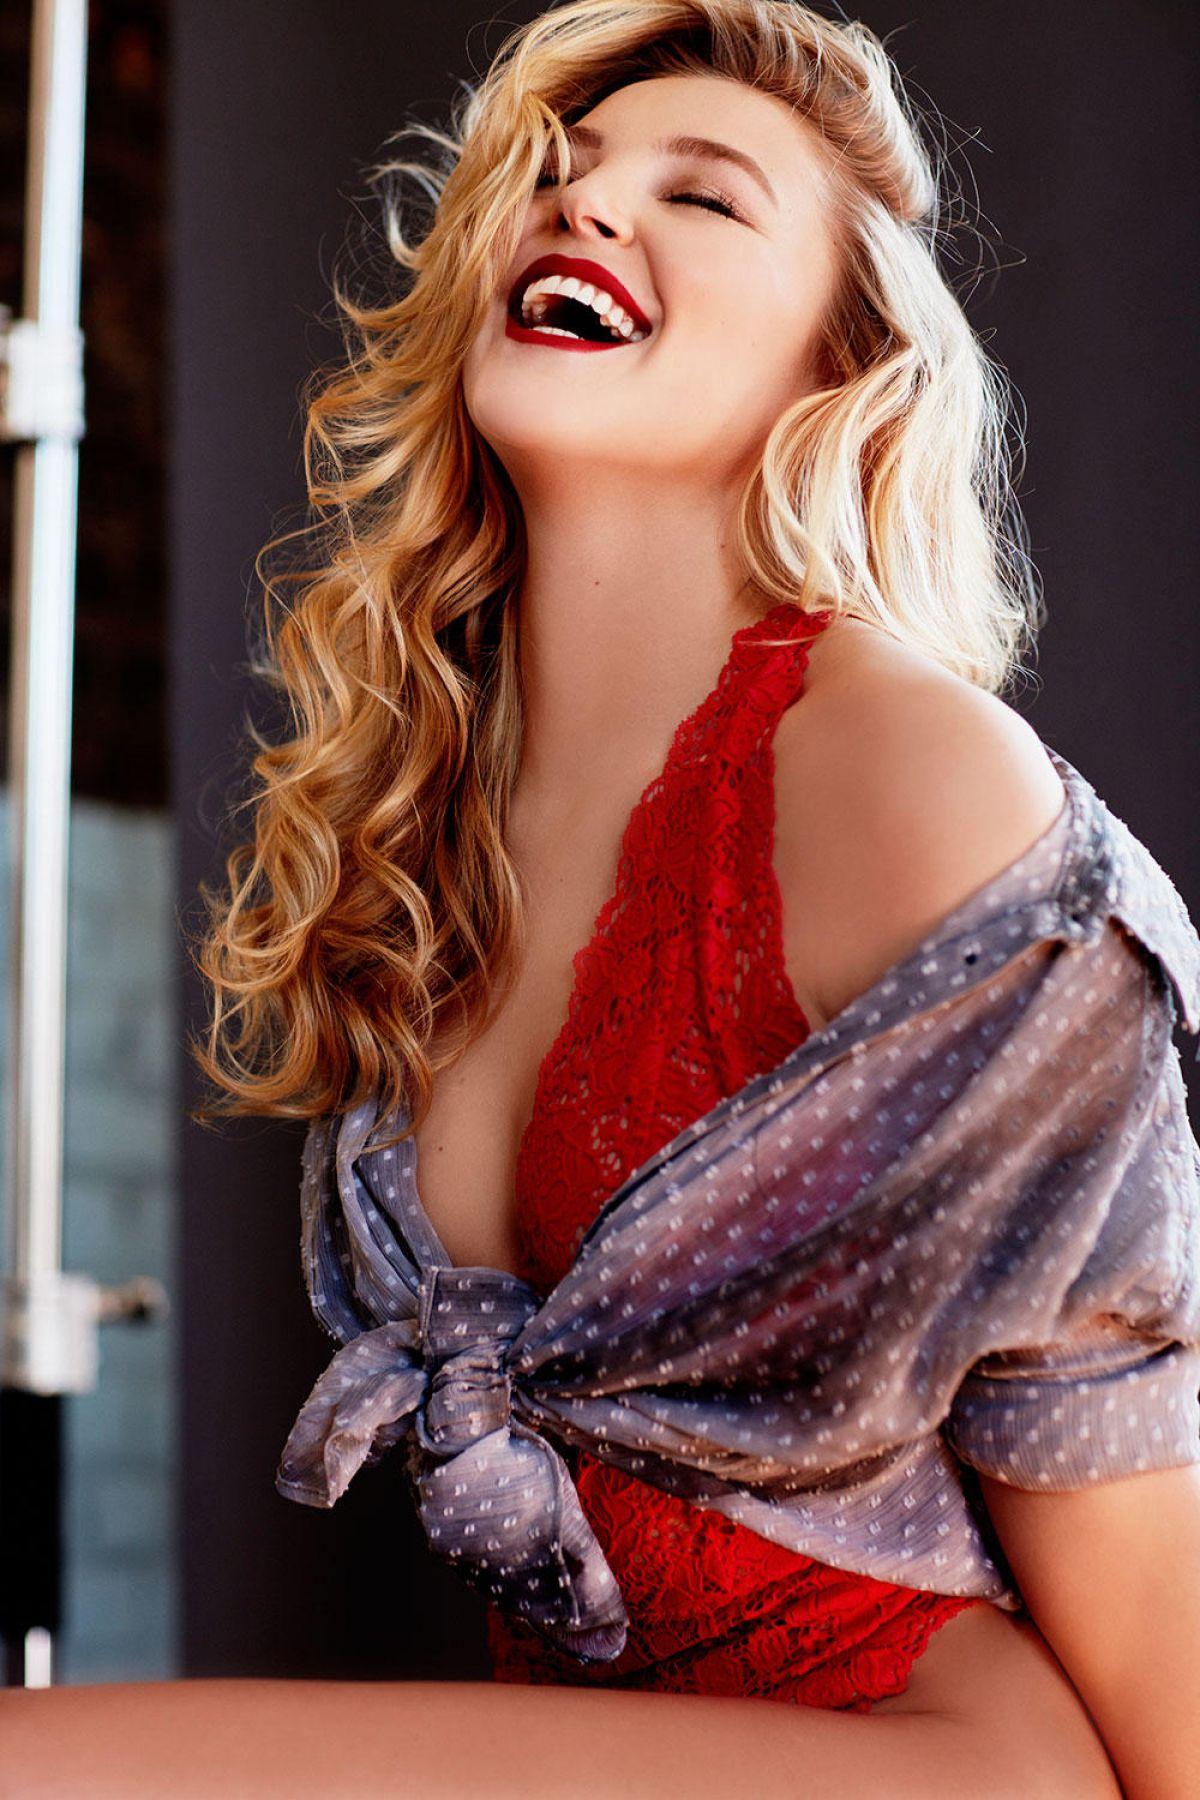 Ovidie Porn video Tamala Jones born November 12, 1974 (age 43),Tilda Swinton